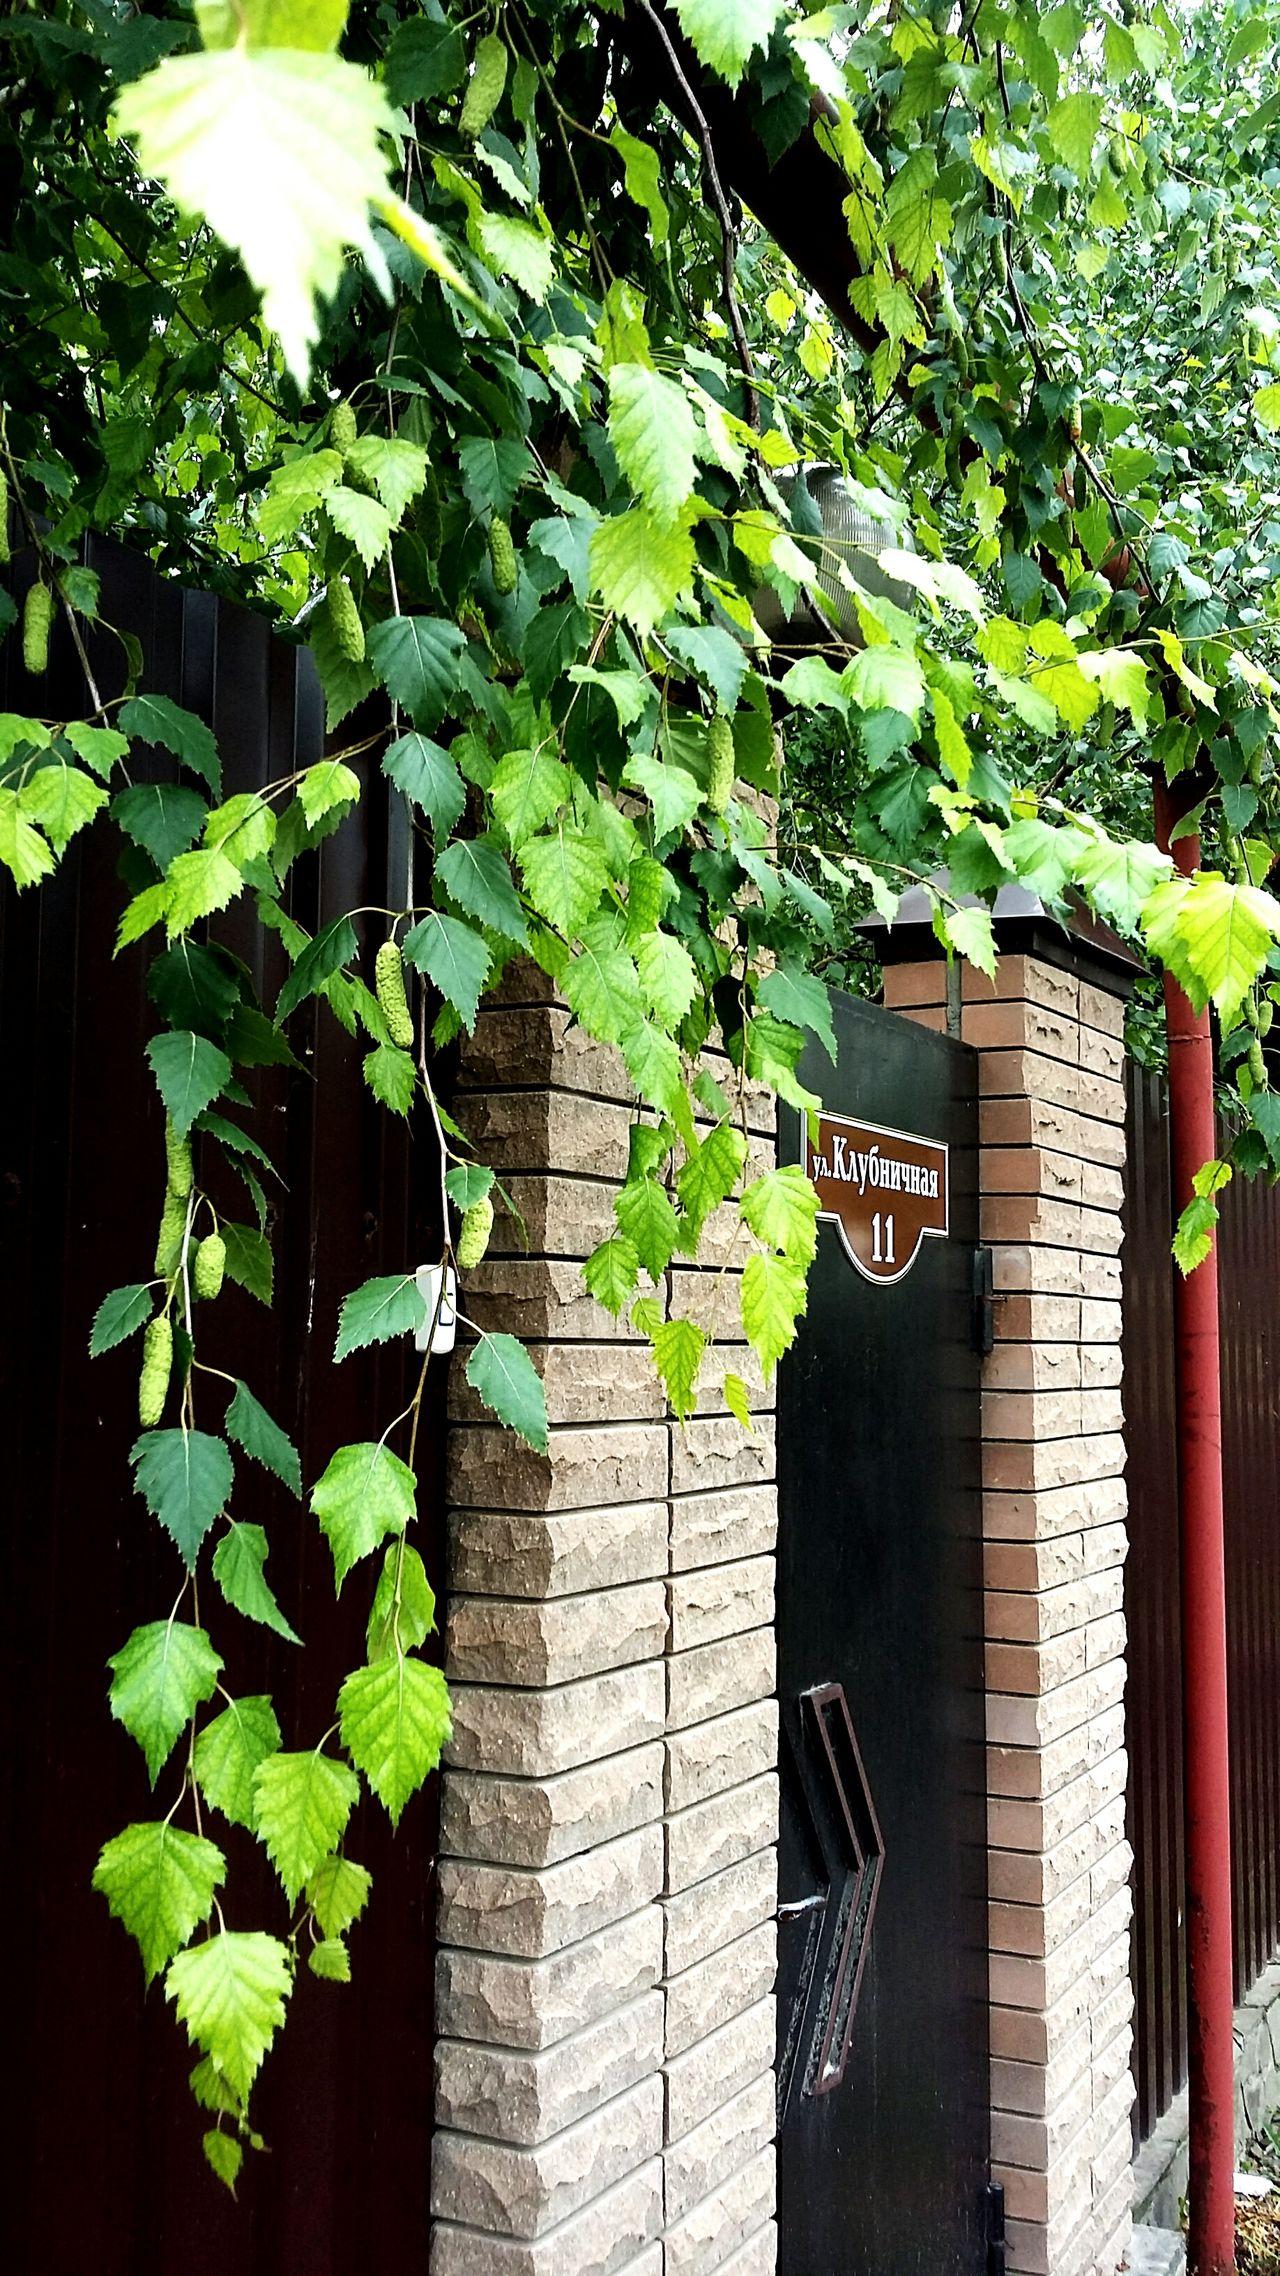 Russia Rostov-on-Don Lubushkino No People Green Color Beauty In Nature Day Nature Green Color Tree Beresa